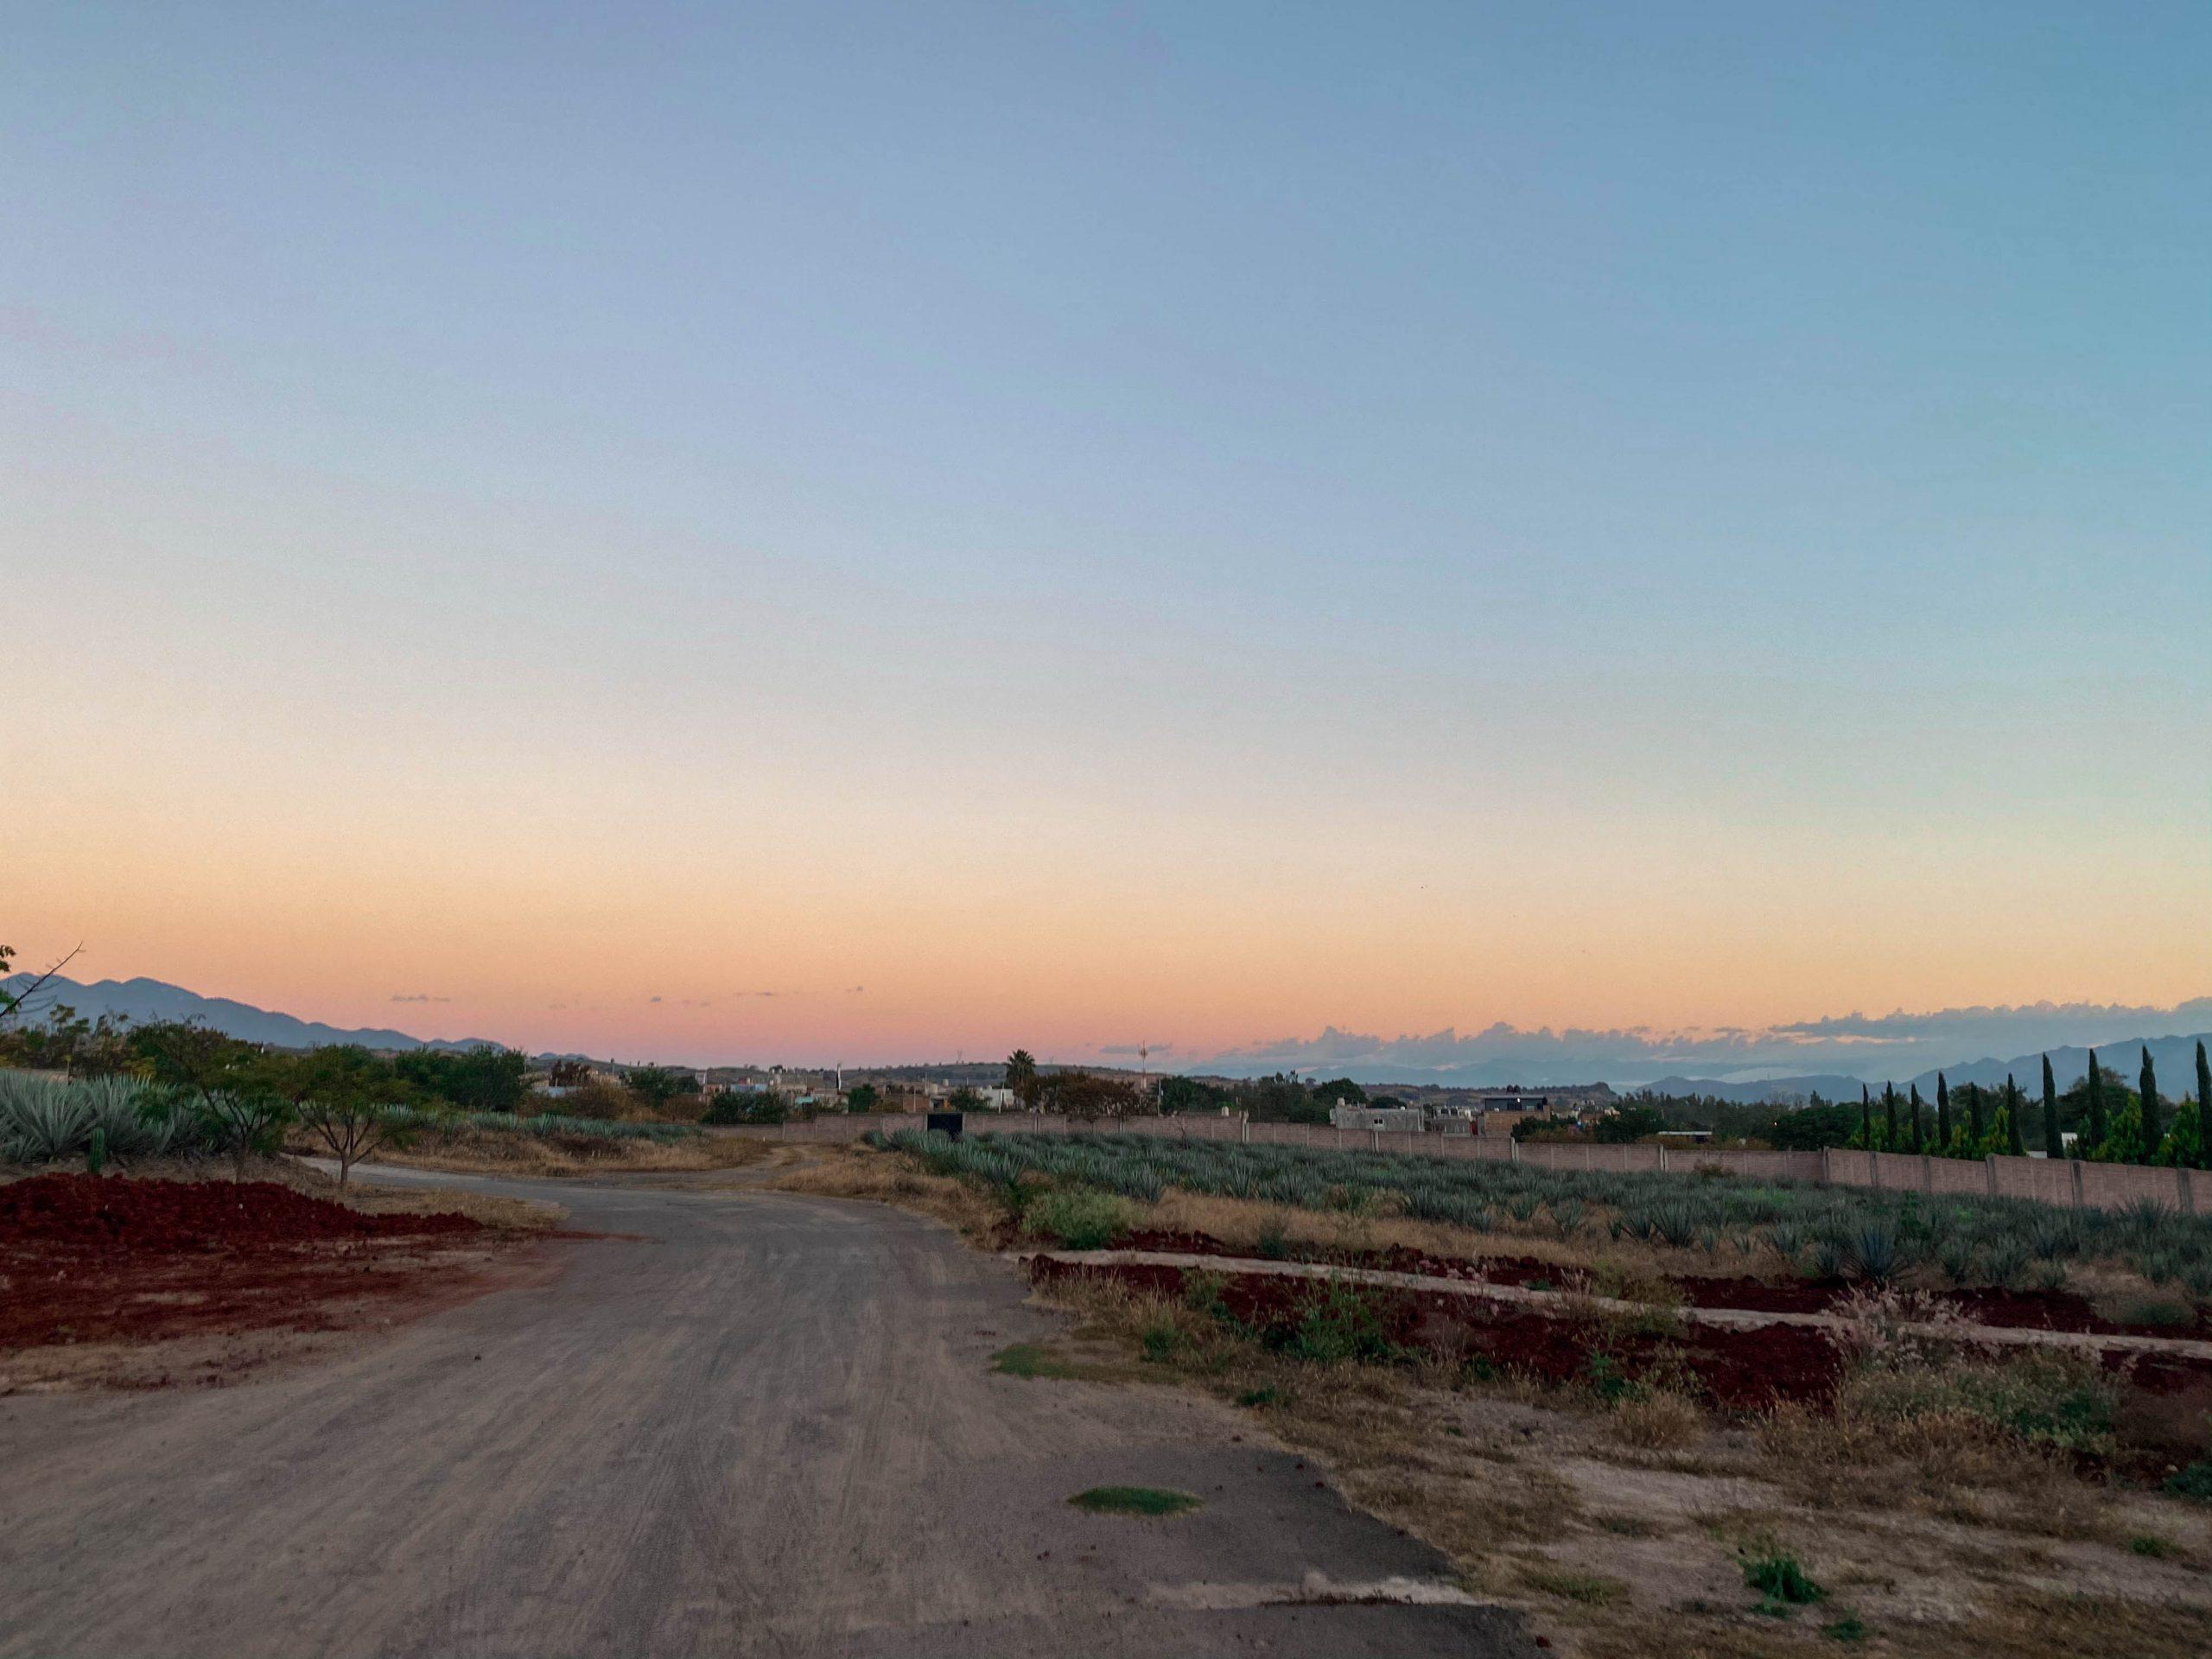 tequila sunrise jalisco mexico dirt road